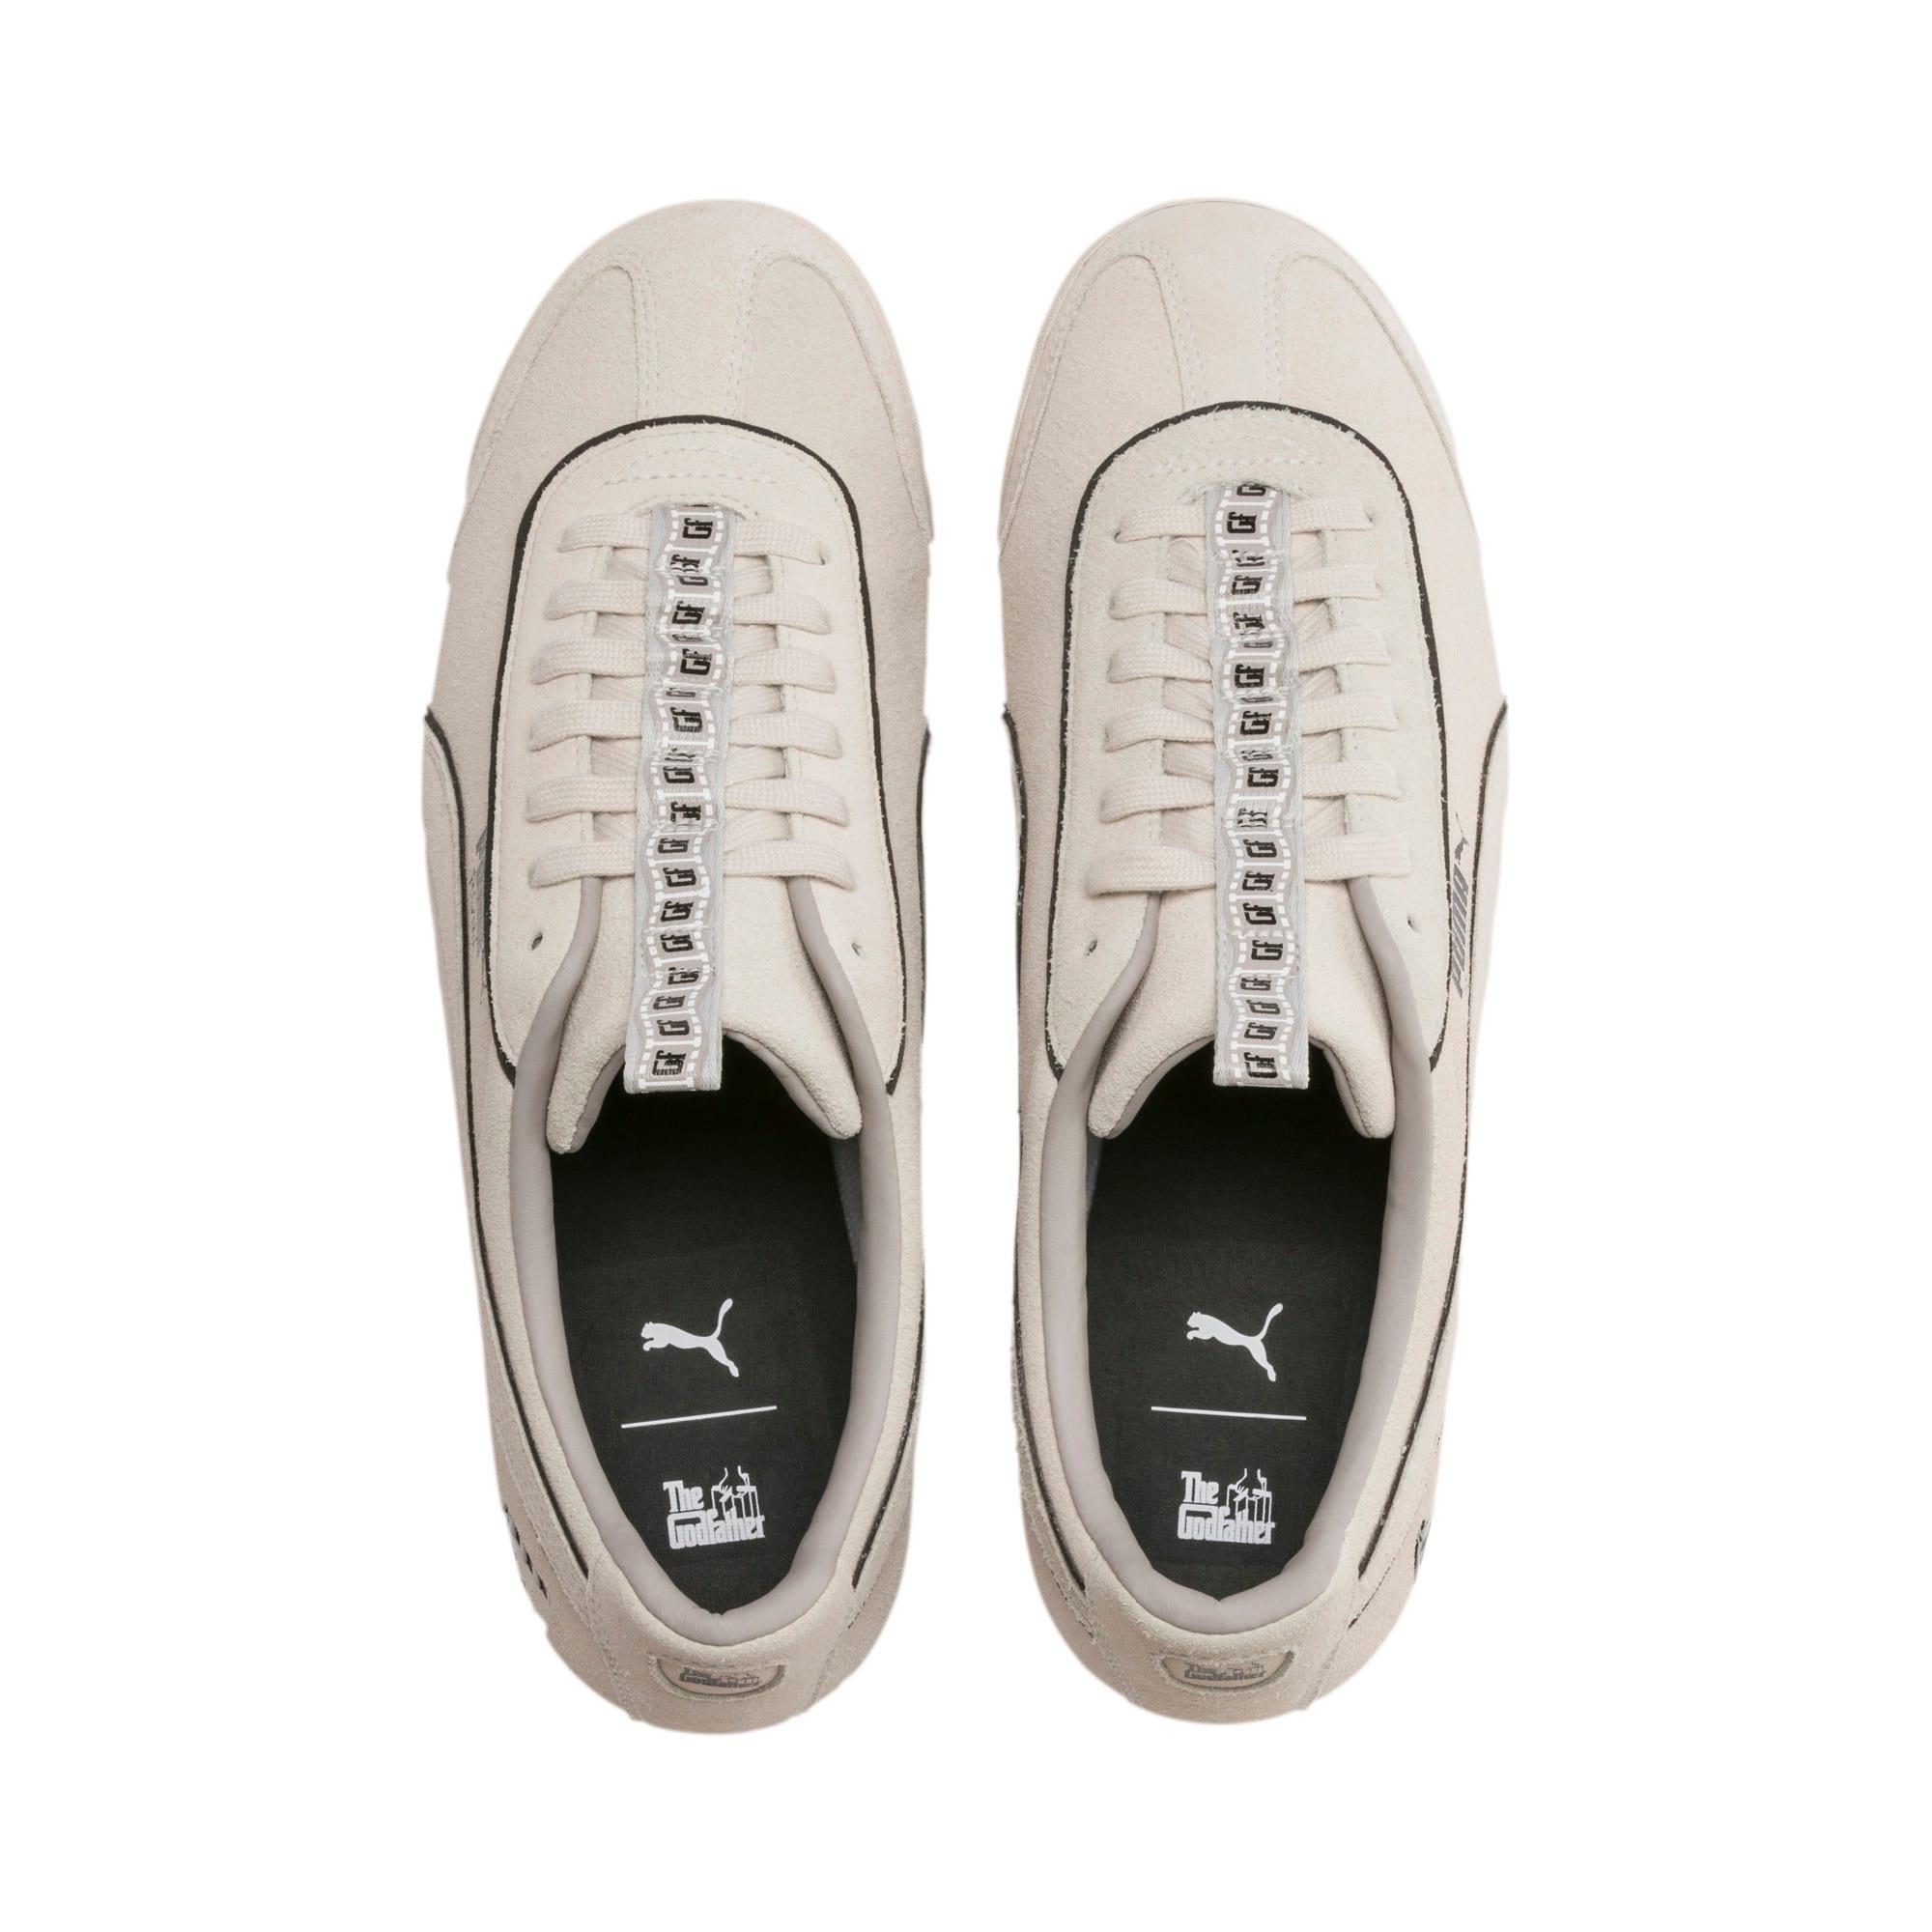 Miniatura 6 de Zapatos deportivos PUMA x THE GODFATHER Roma Woltz, WINDCHIME-Puma negro, mediano